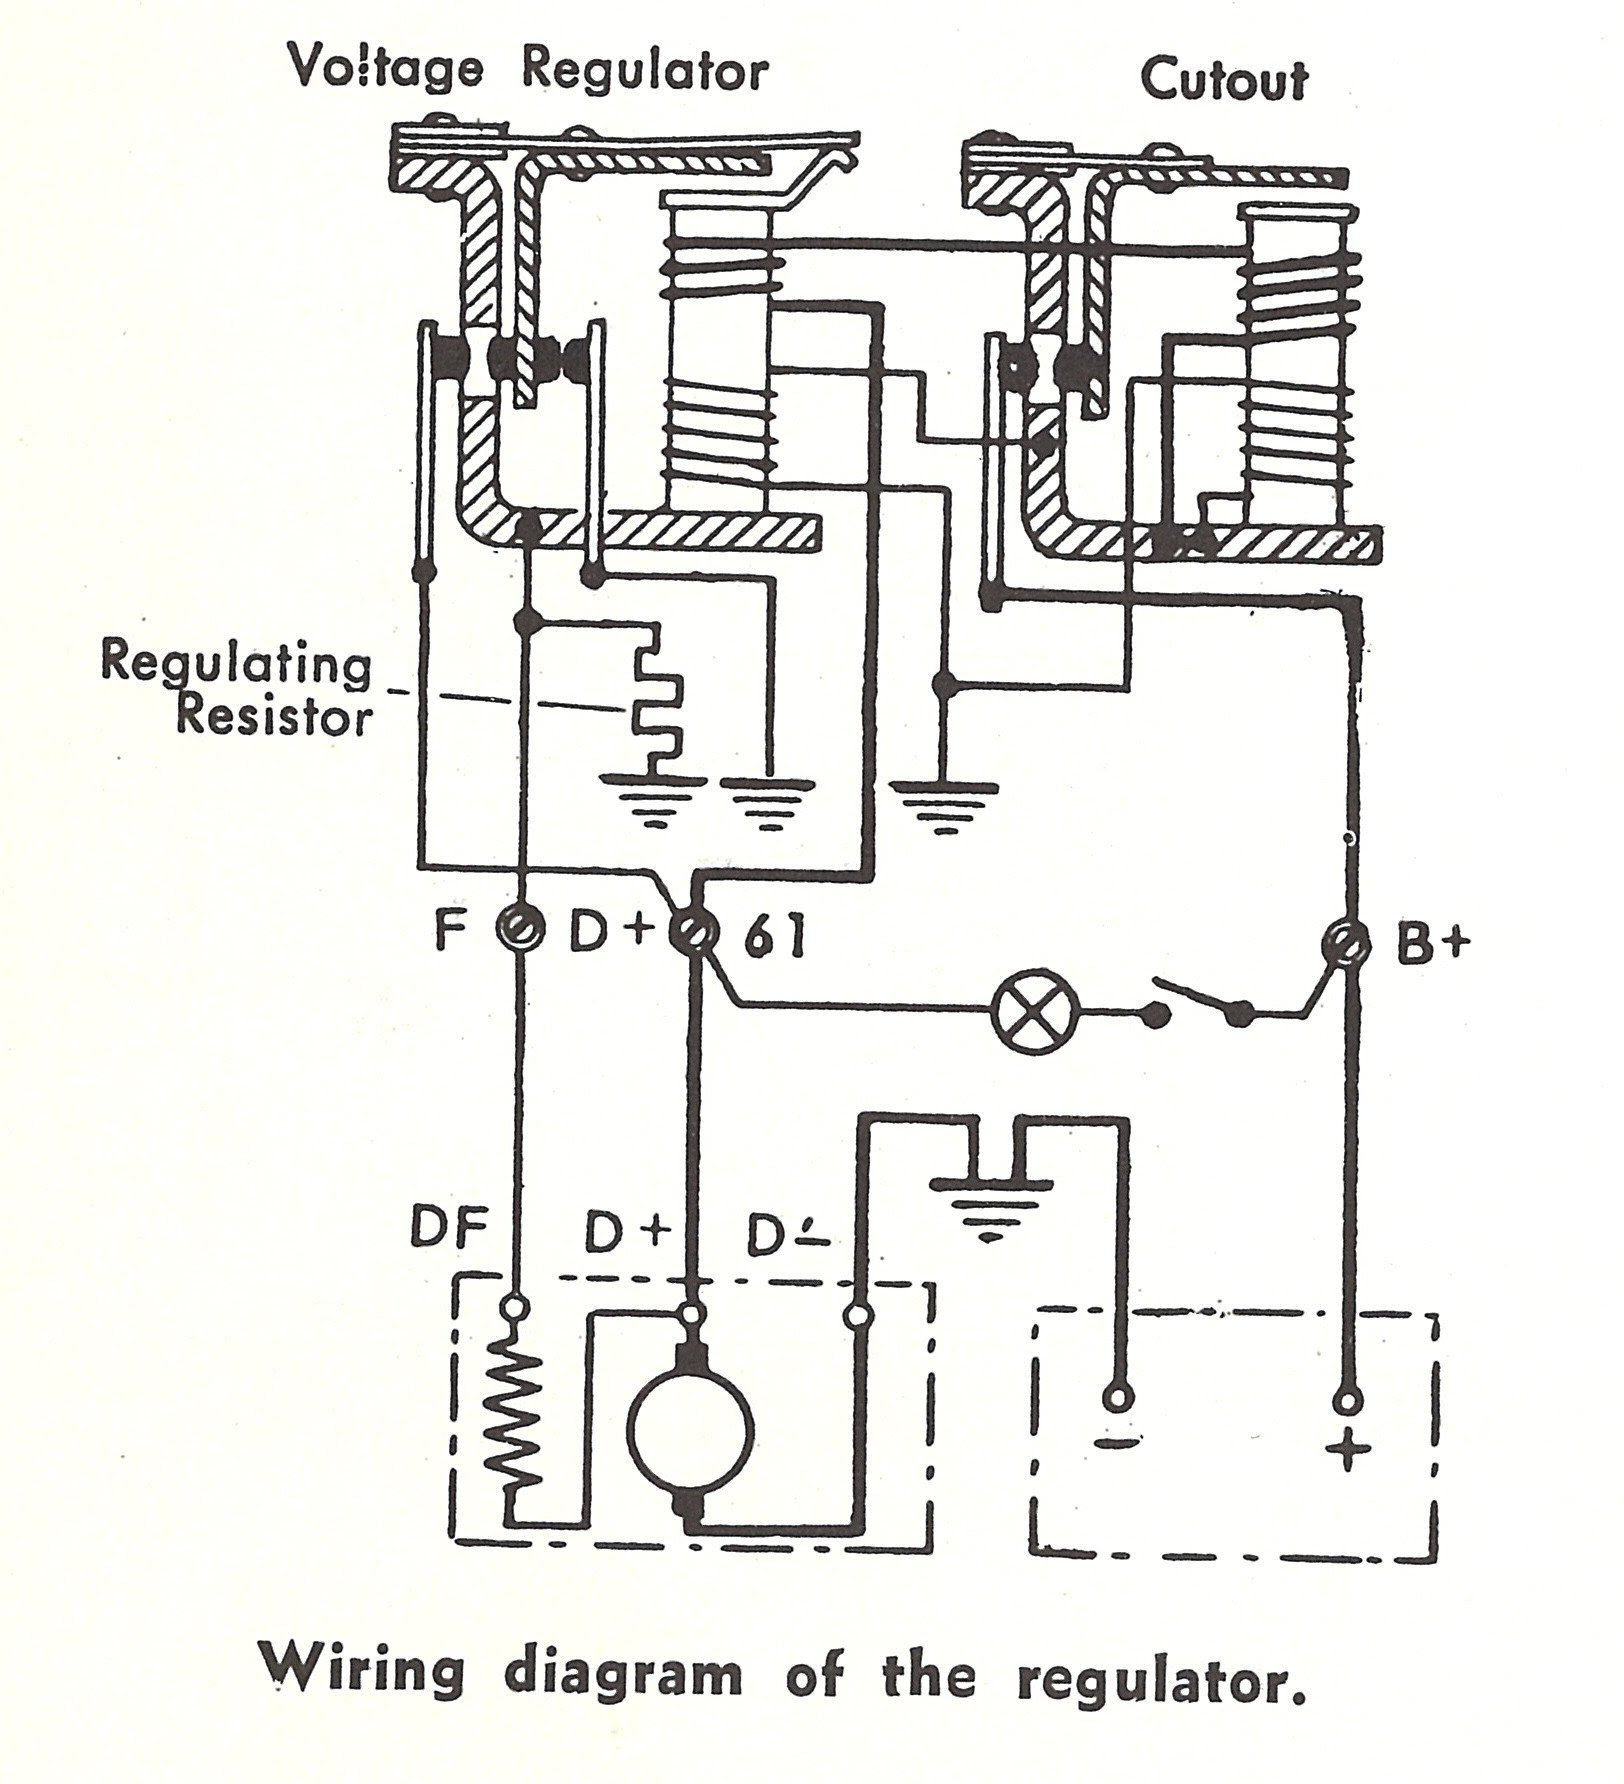 Diagram Kawasaki Fd750 Regulator Wiring Diagram Full Version Hd Quality Wiring Diagram Diagramofadns Argiso It